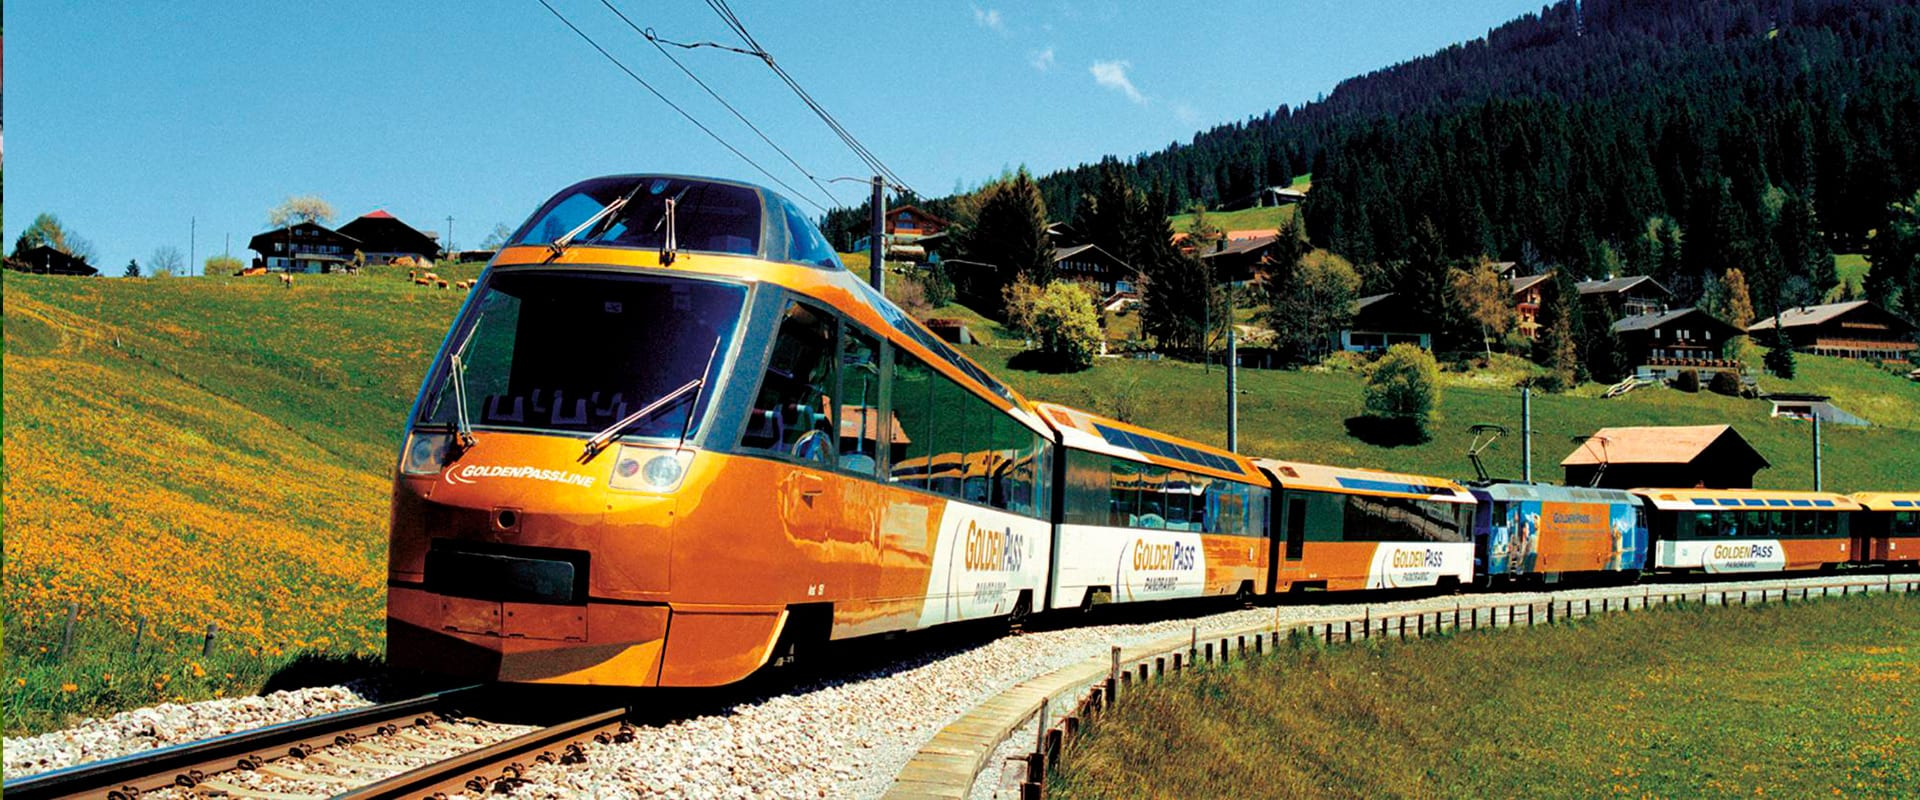 Pacote Os Cumes Nevados & Golden Pass Line